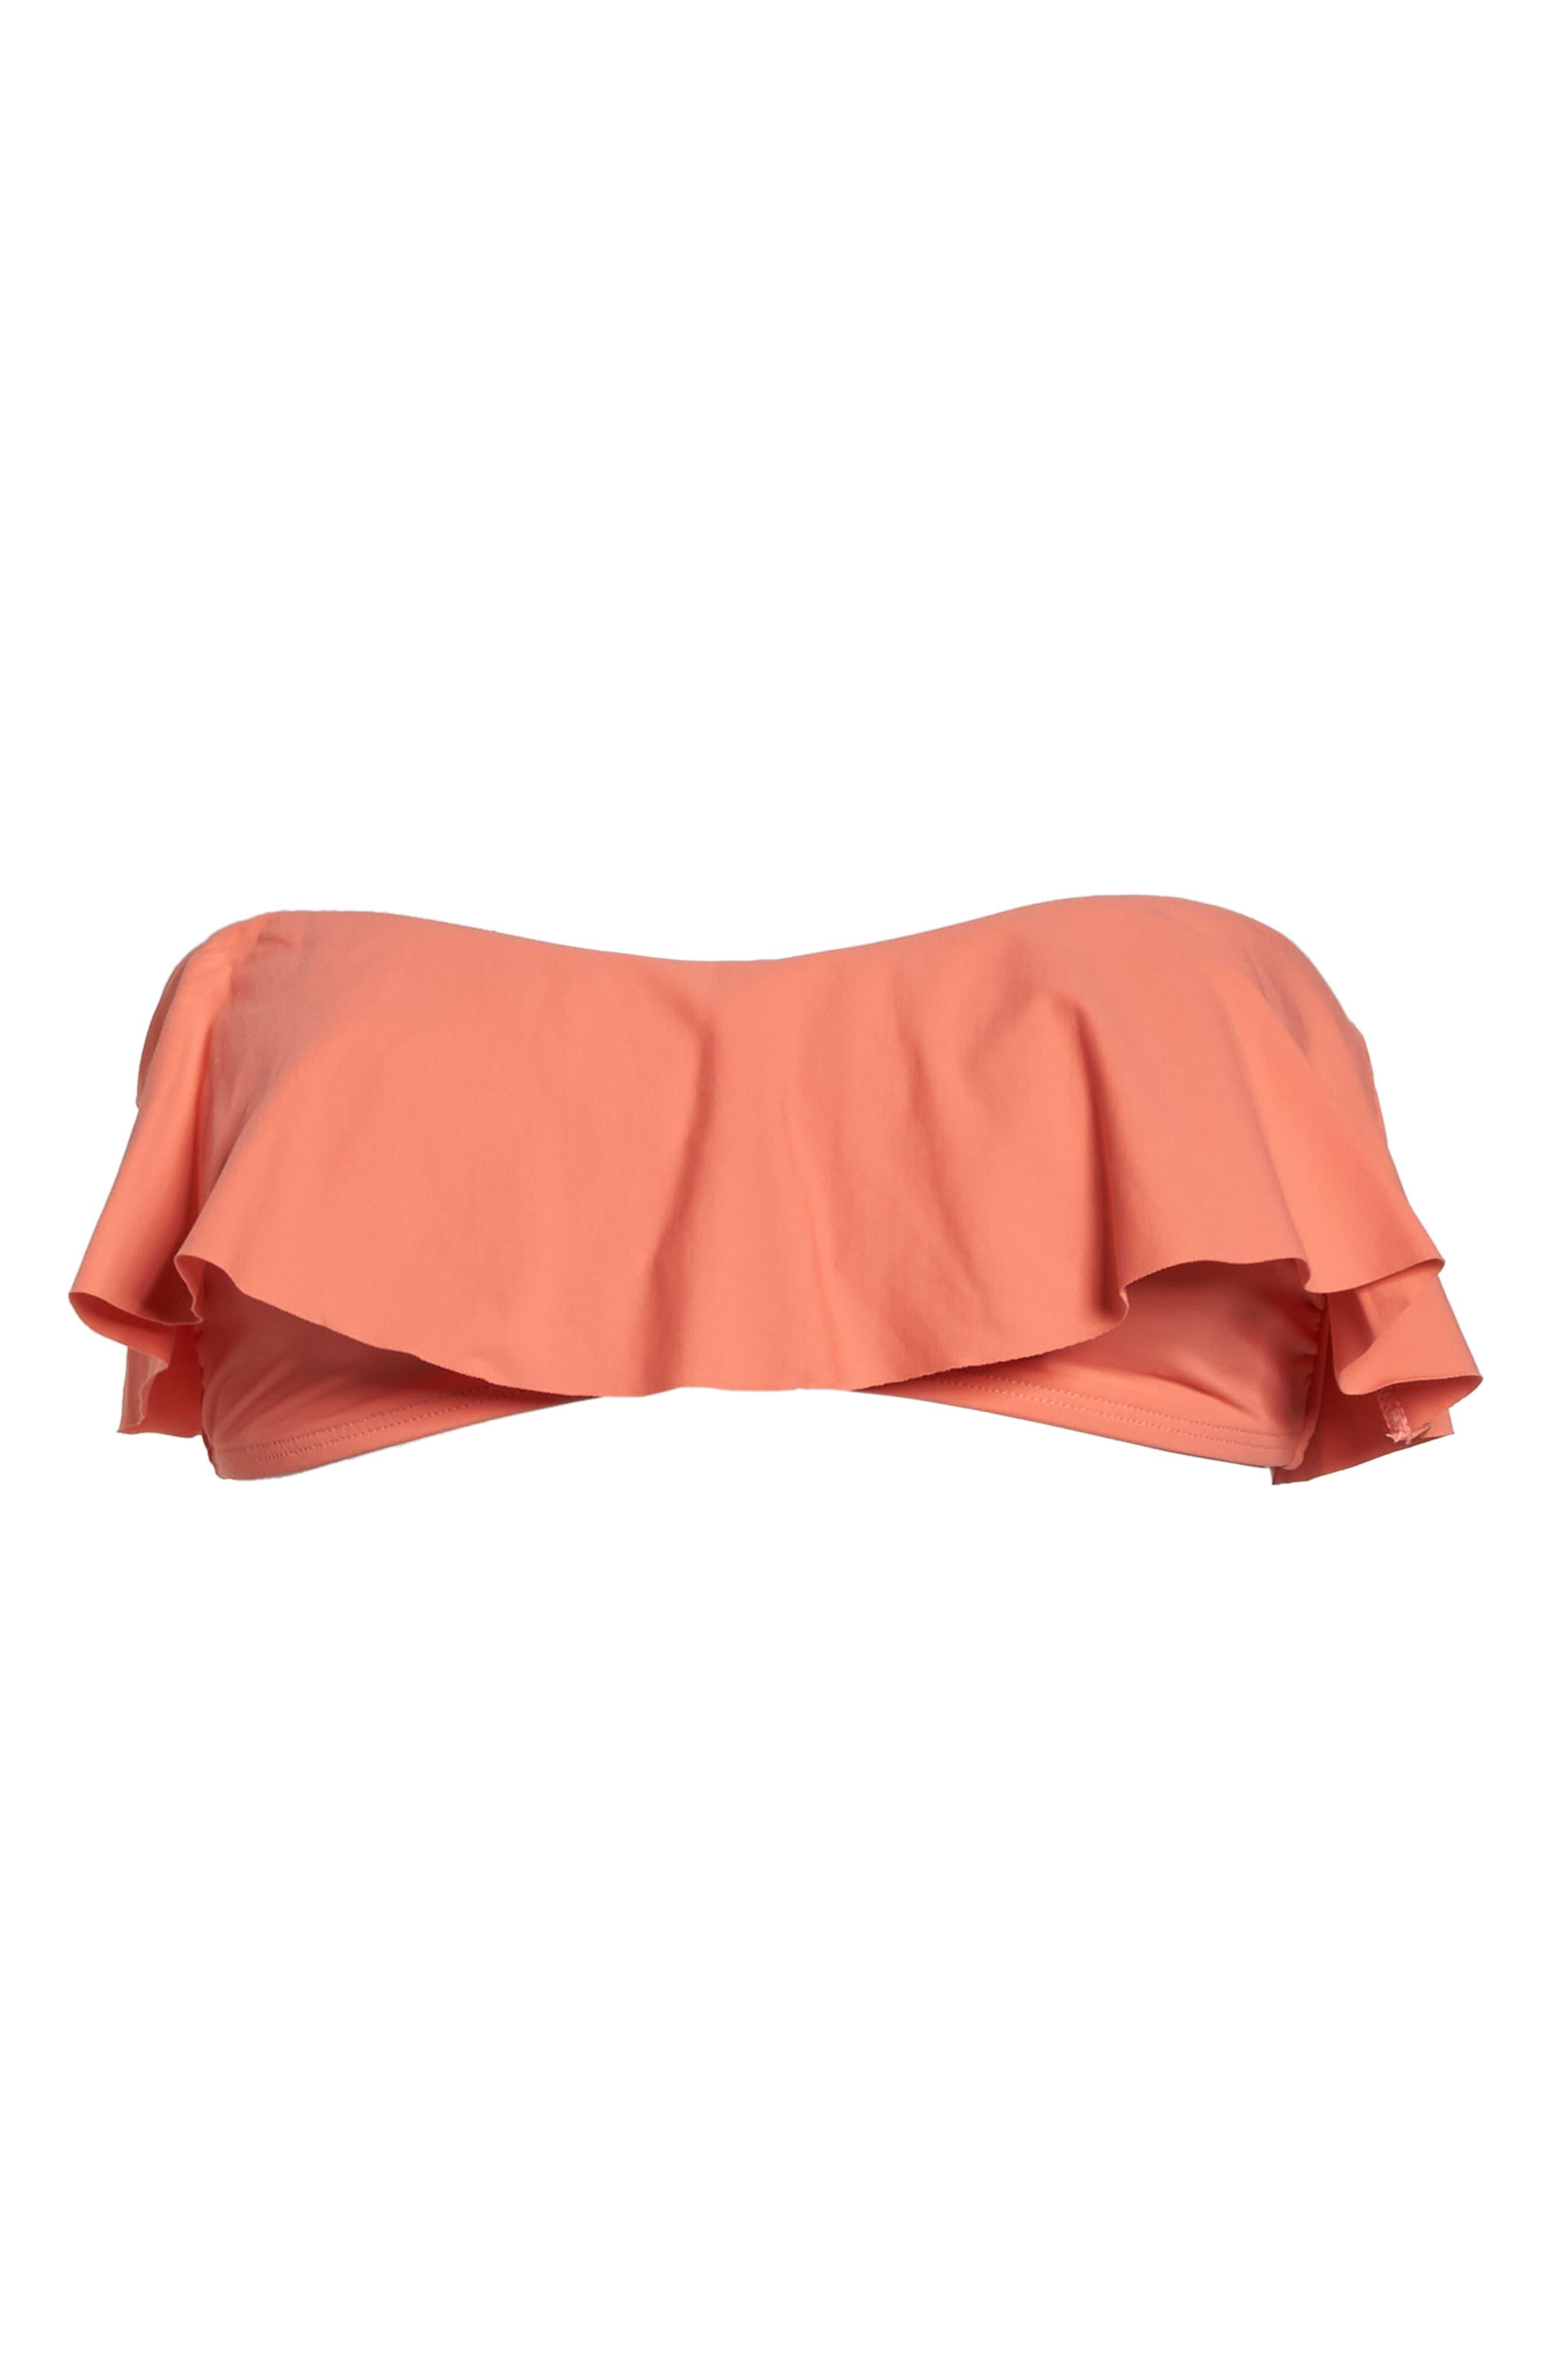 Lynn Ruffle Bikini Top,                             Alternate thumbnail 9, color,                             Fruit Punch